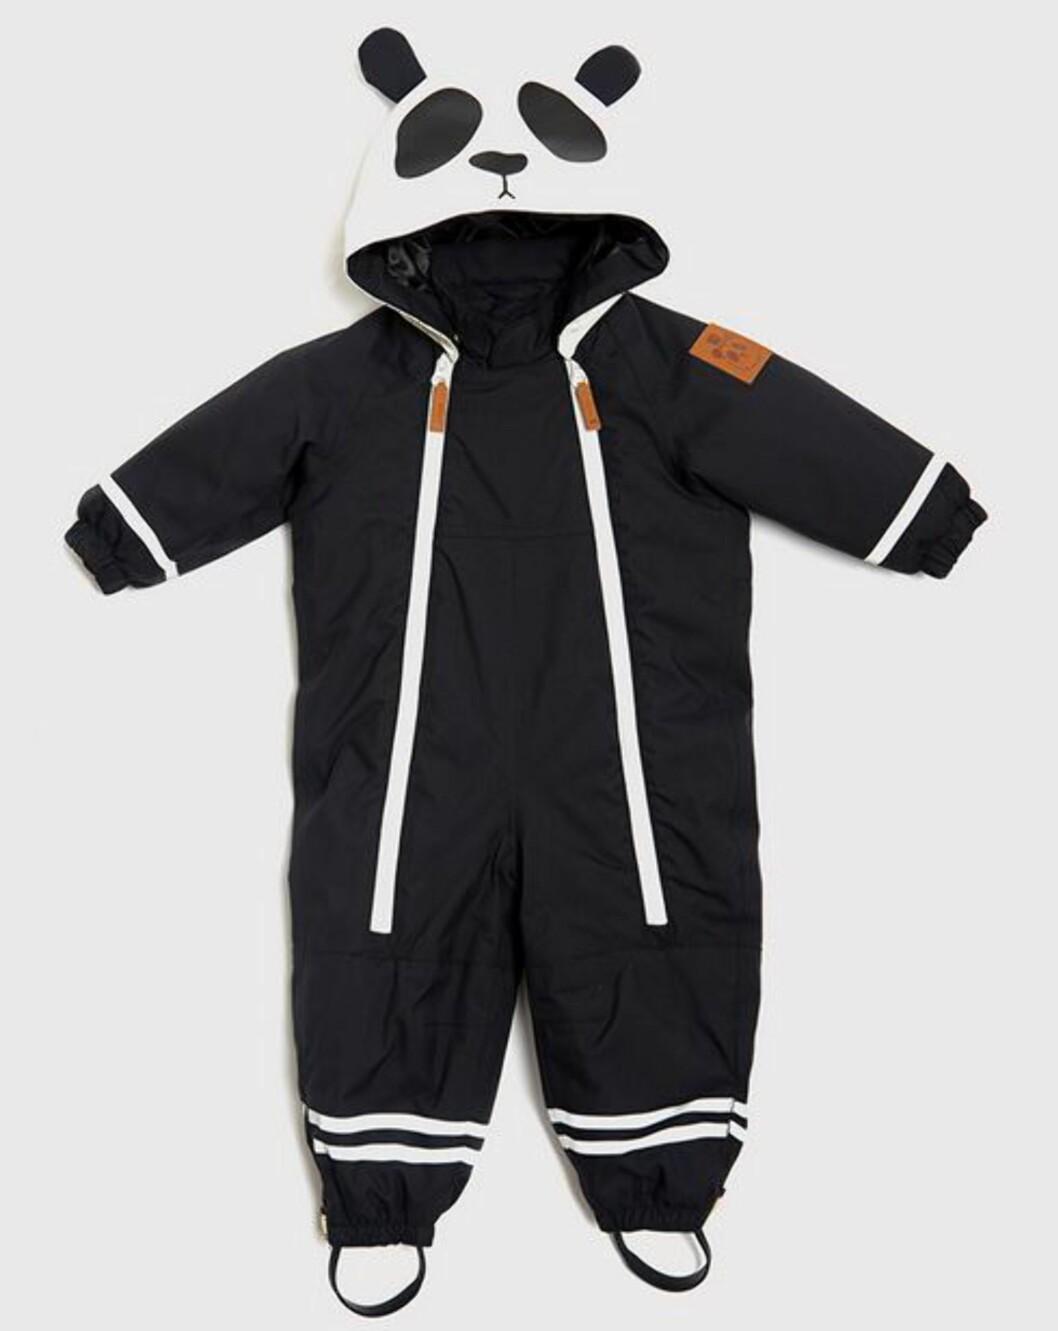 ESPIDITION ALASKA: Søt panda-vinterdress for de minste fra Mini Rodini. Pris kr 1599,- hos Miinto.no. Foto: Produsenten